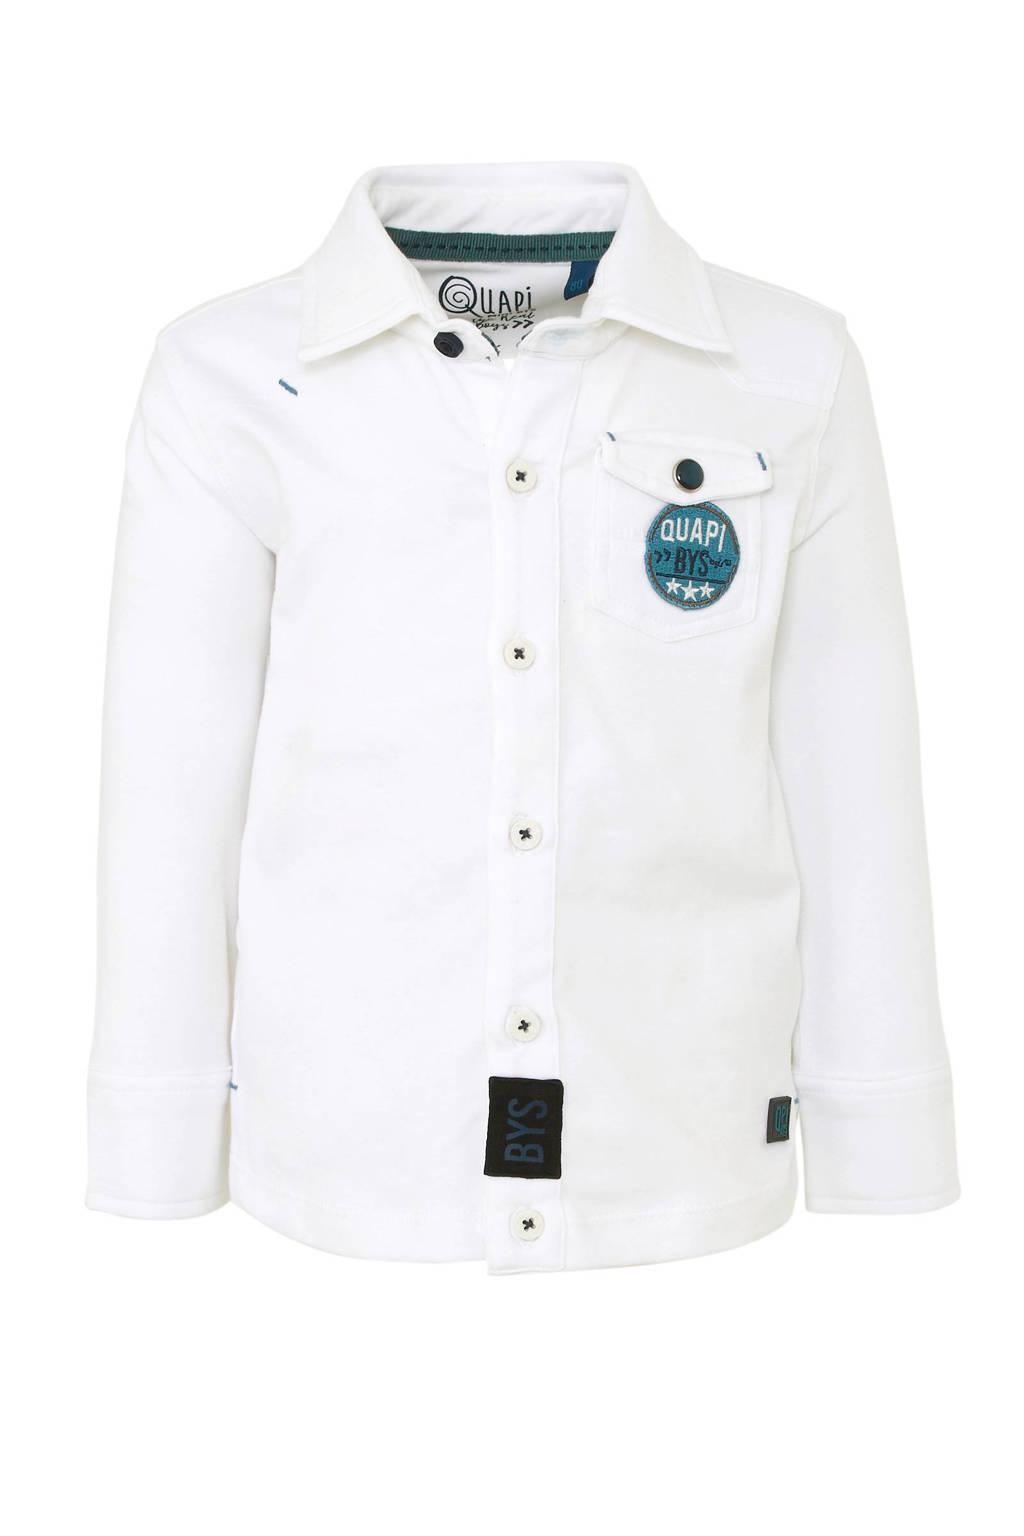 Quapi overhemd met logo wit, Wit